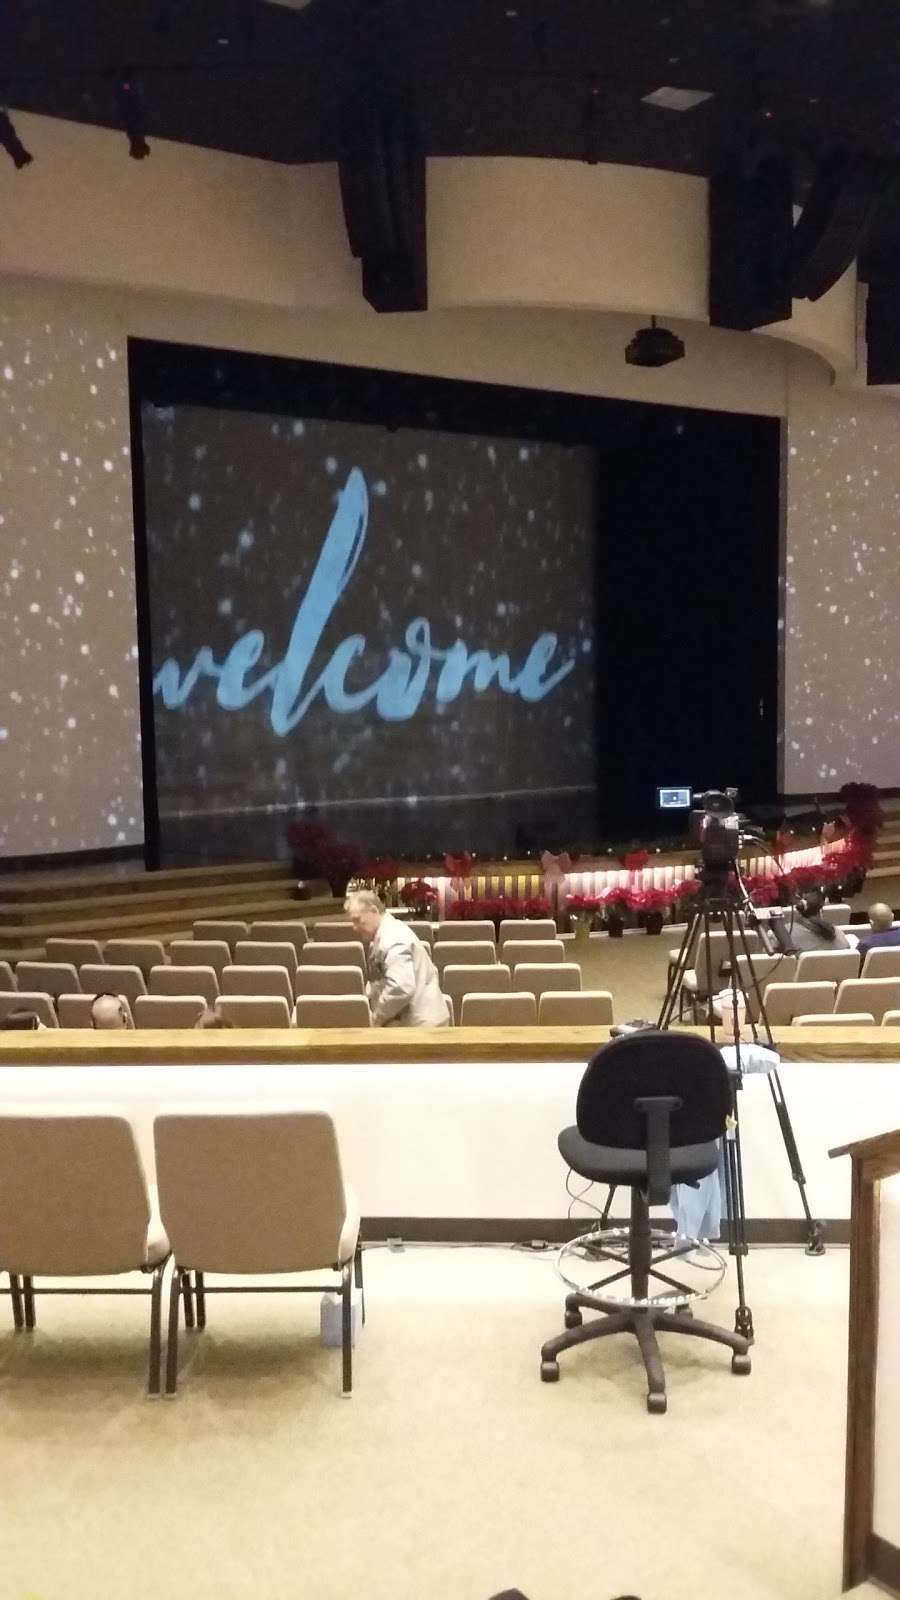 Crossroads Fellowship - church  | Photo 1 of 10 | Address: 12110 East Sam Houston Pkwy N, Houston, TX 77044, USA | Phone: (713) 455-1661